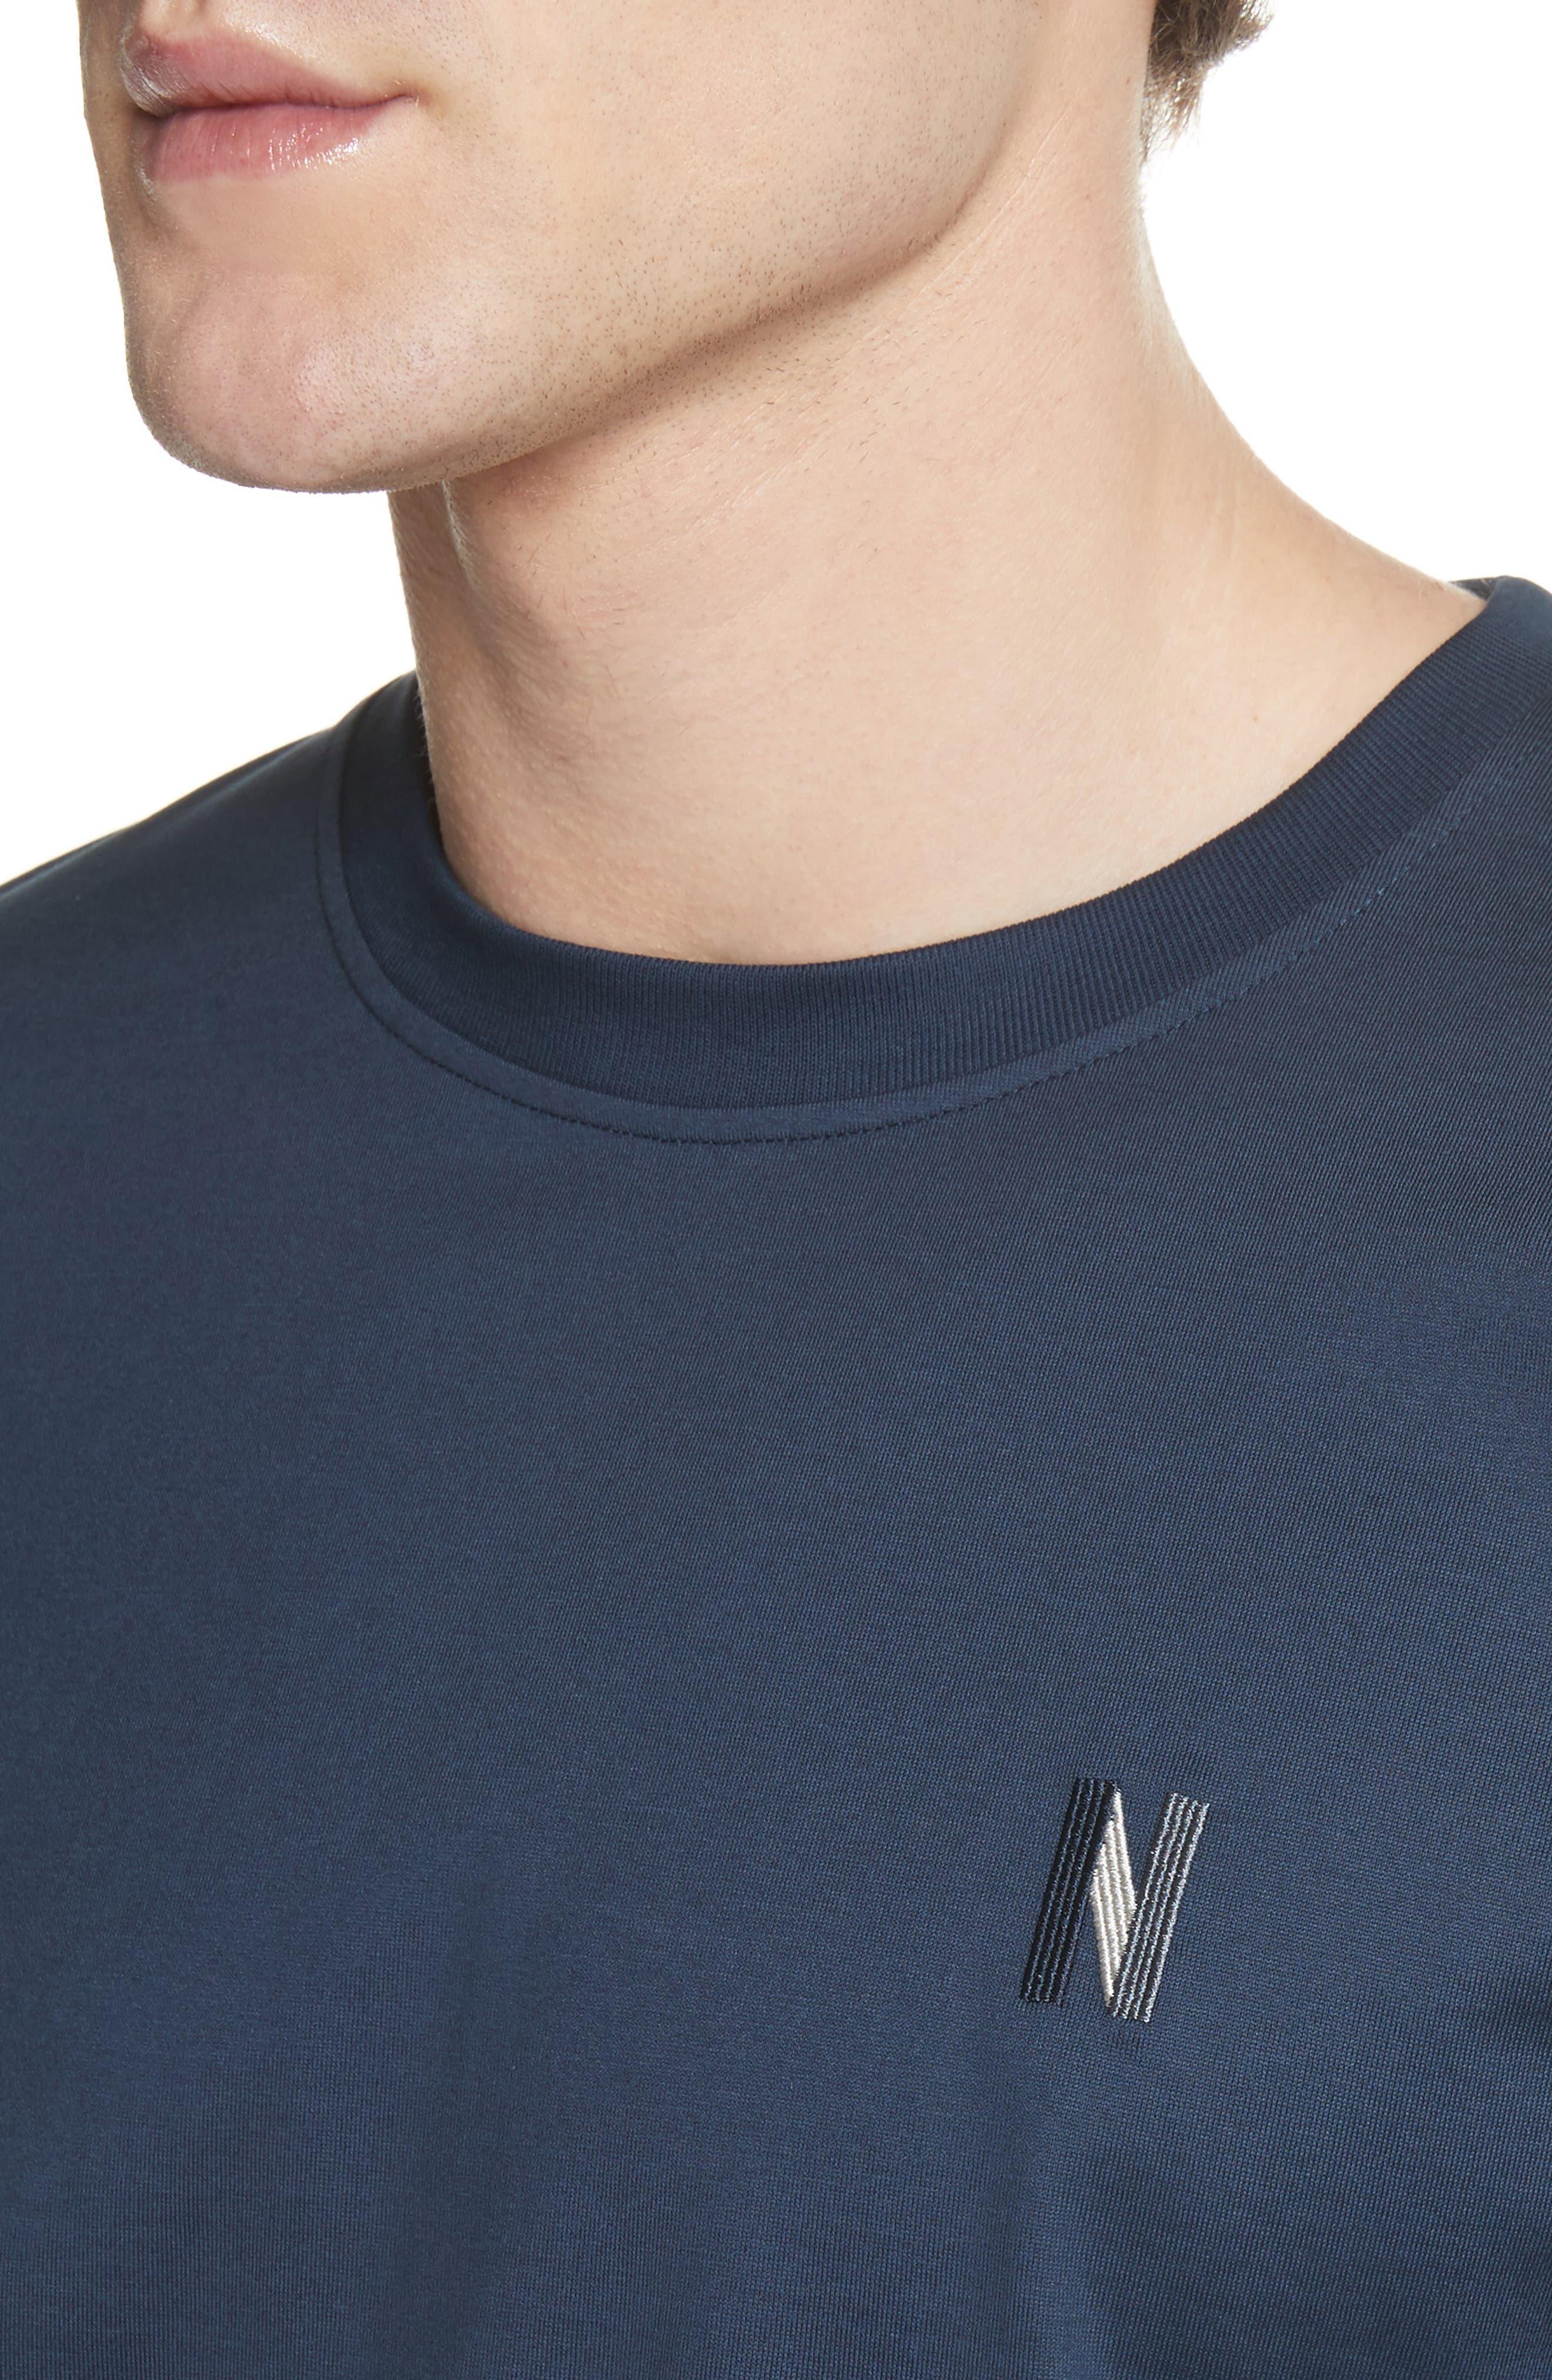 Niels N-Logo T-Shirt,                             Alternate thumbnail 4, color,                             Dark Navy